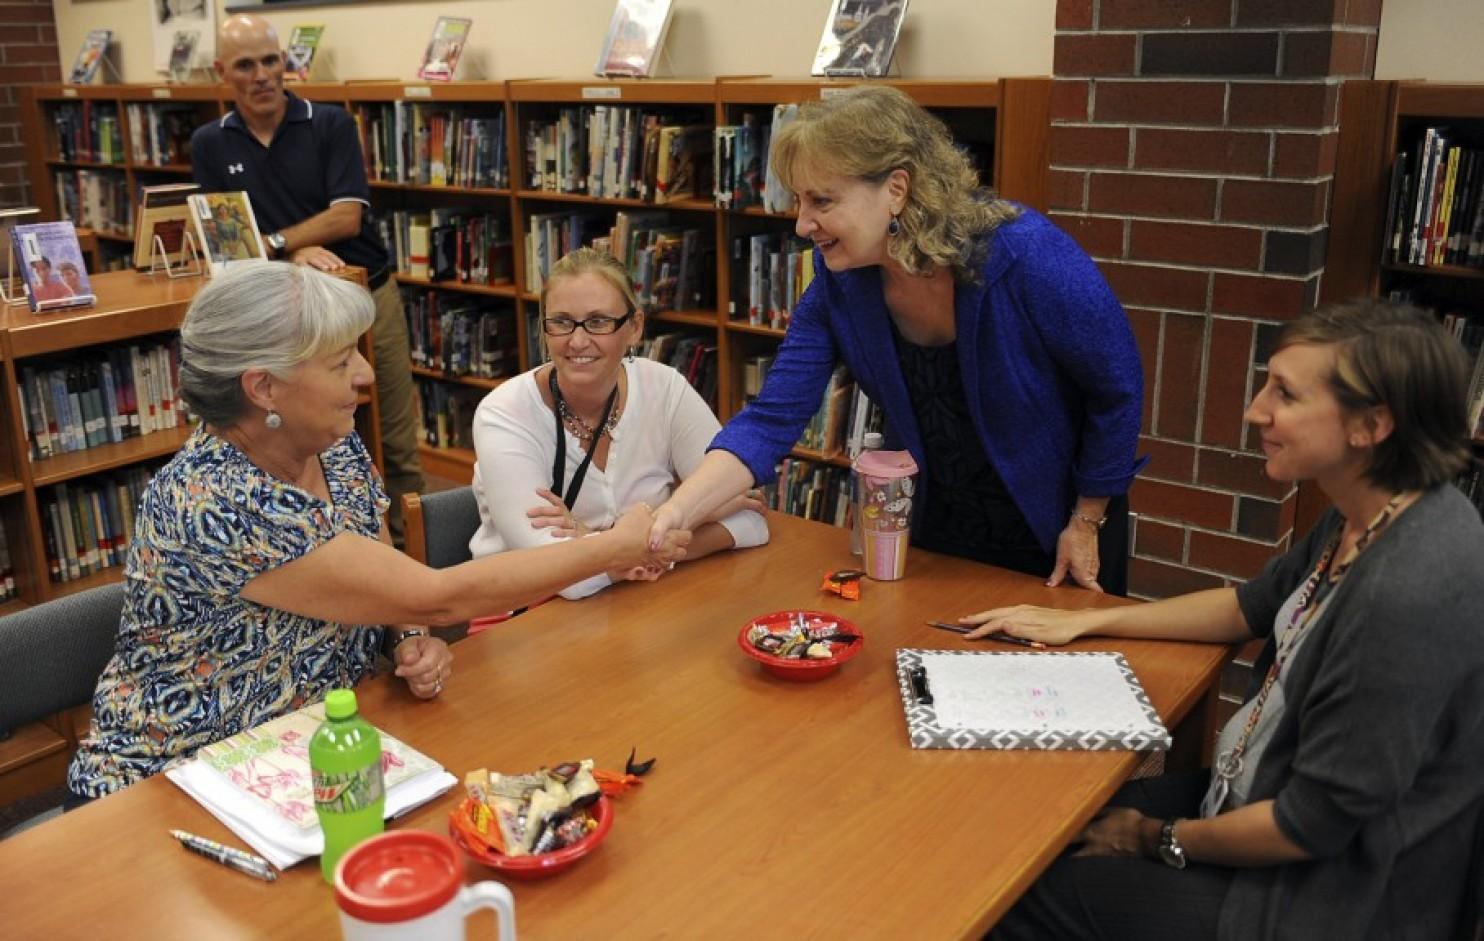 Enhancing collaborative work among teachers